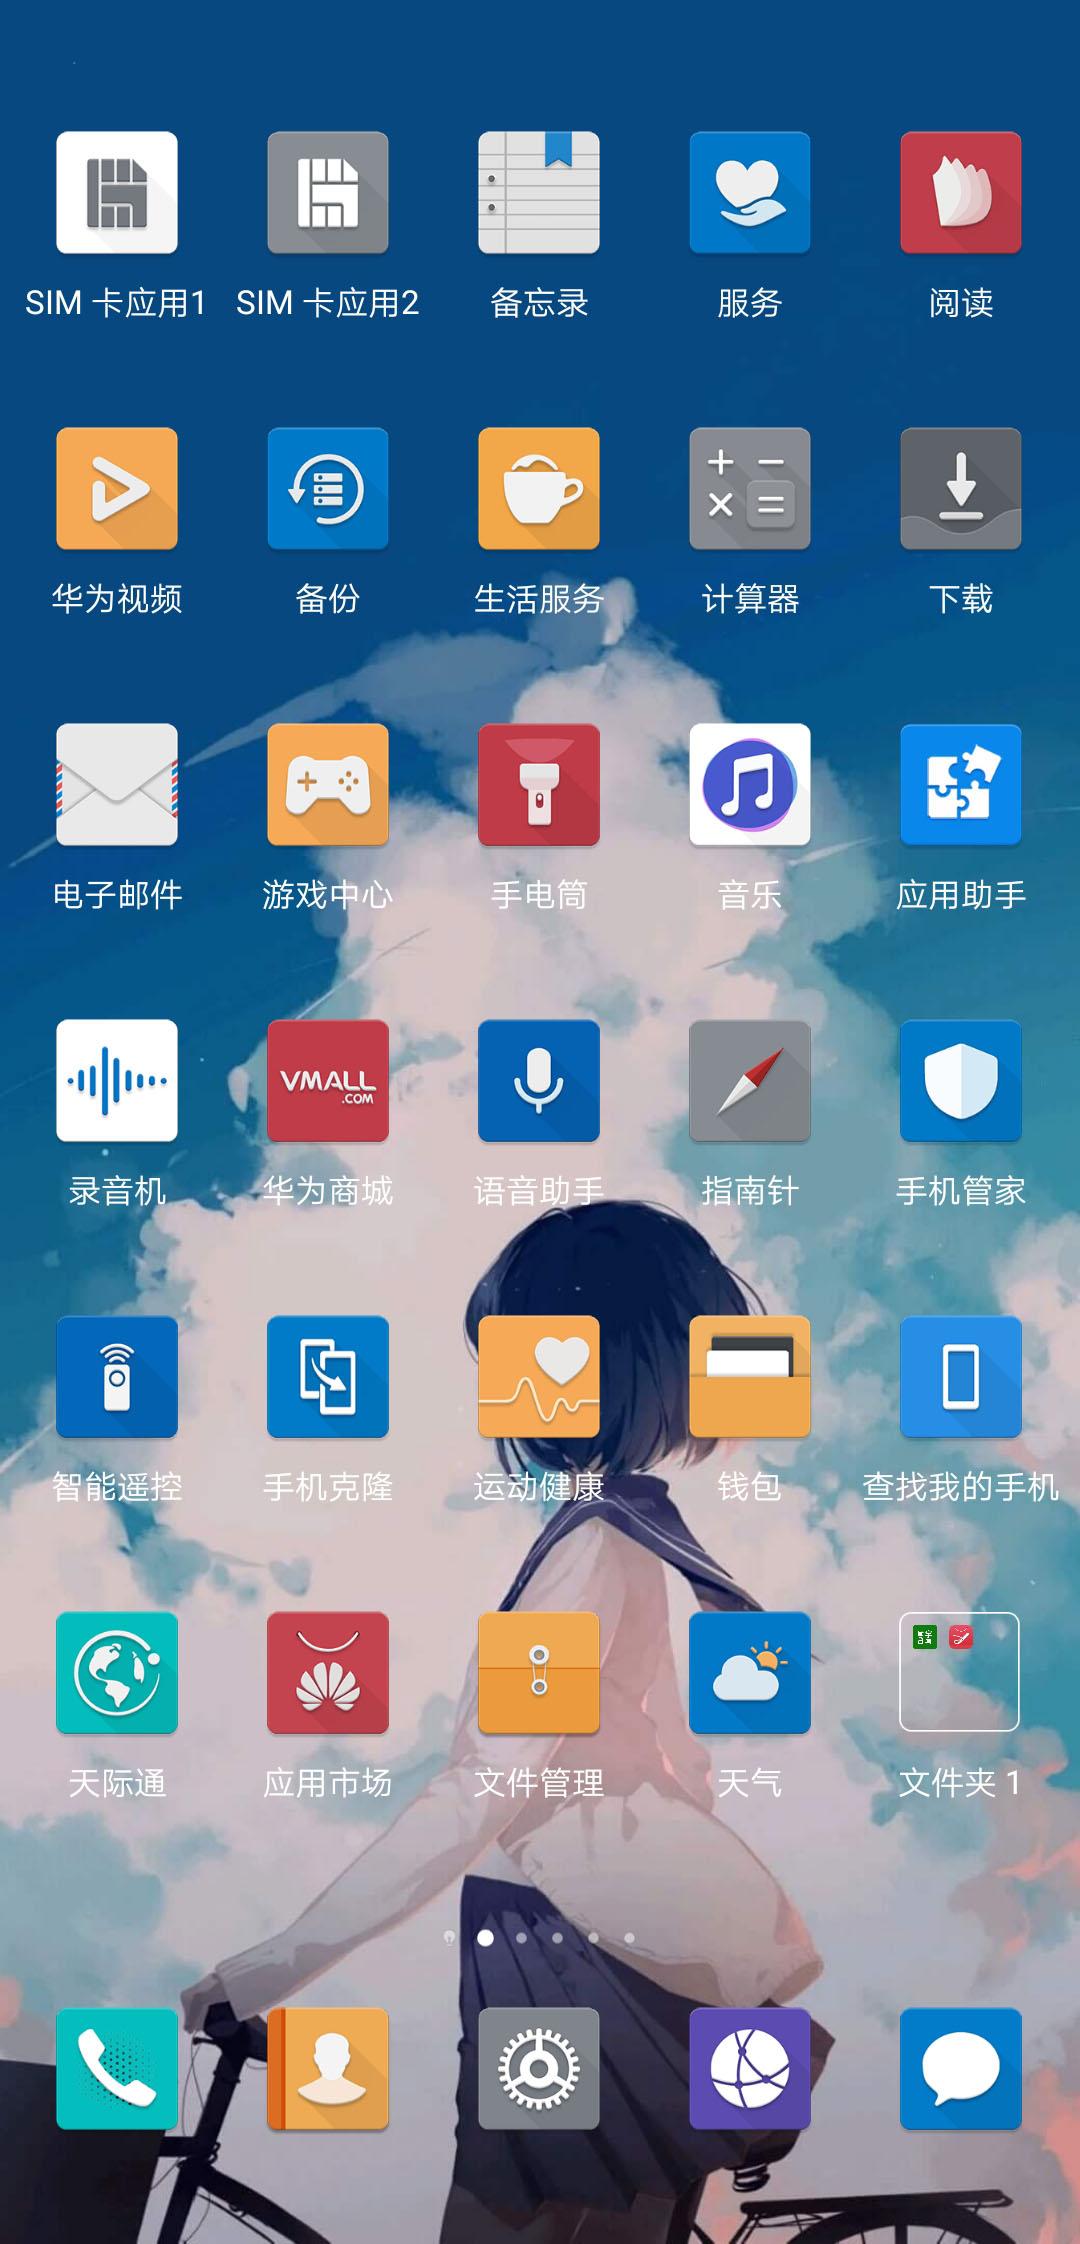 Screenshot_20190406_020929_com.huawei.android.lau.jpg